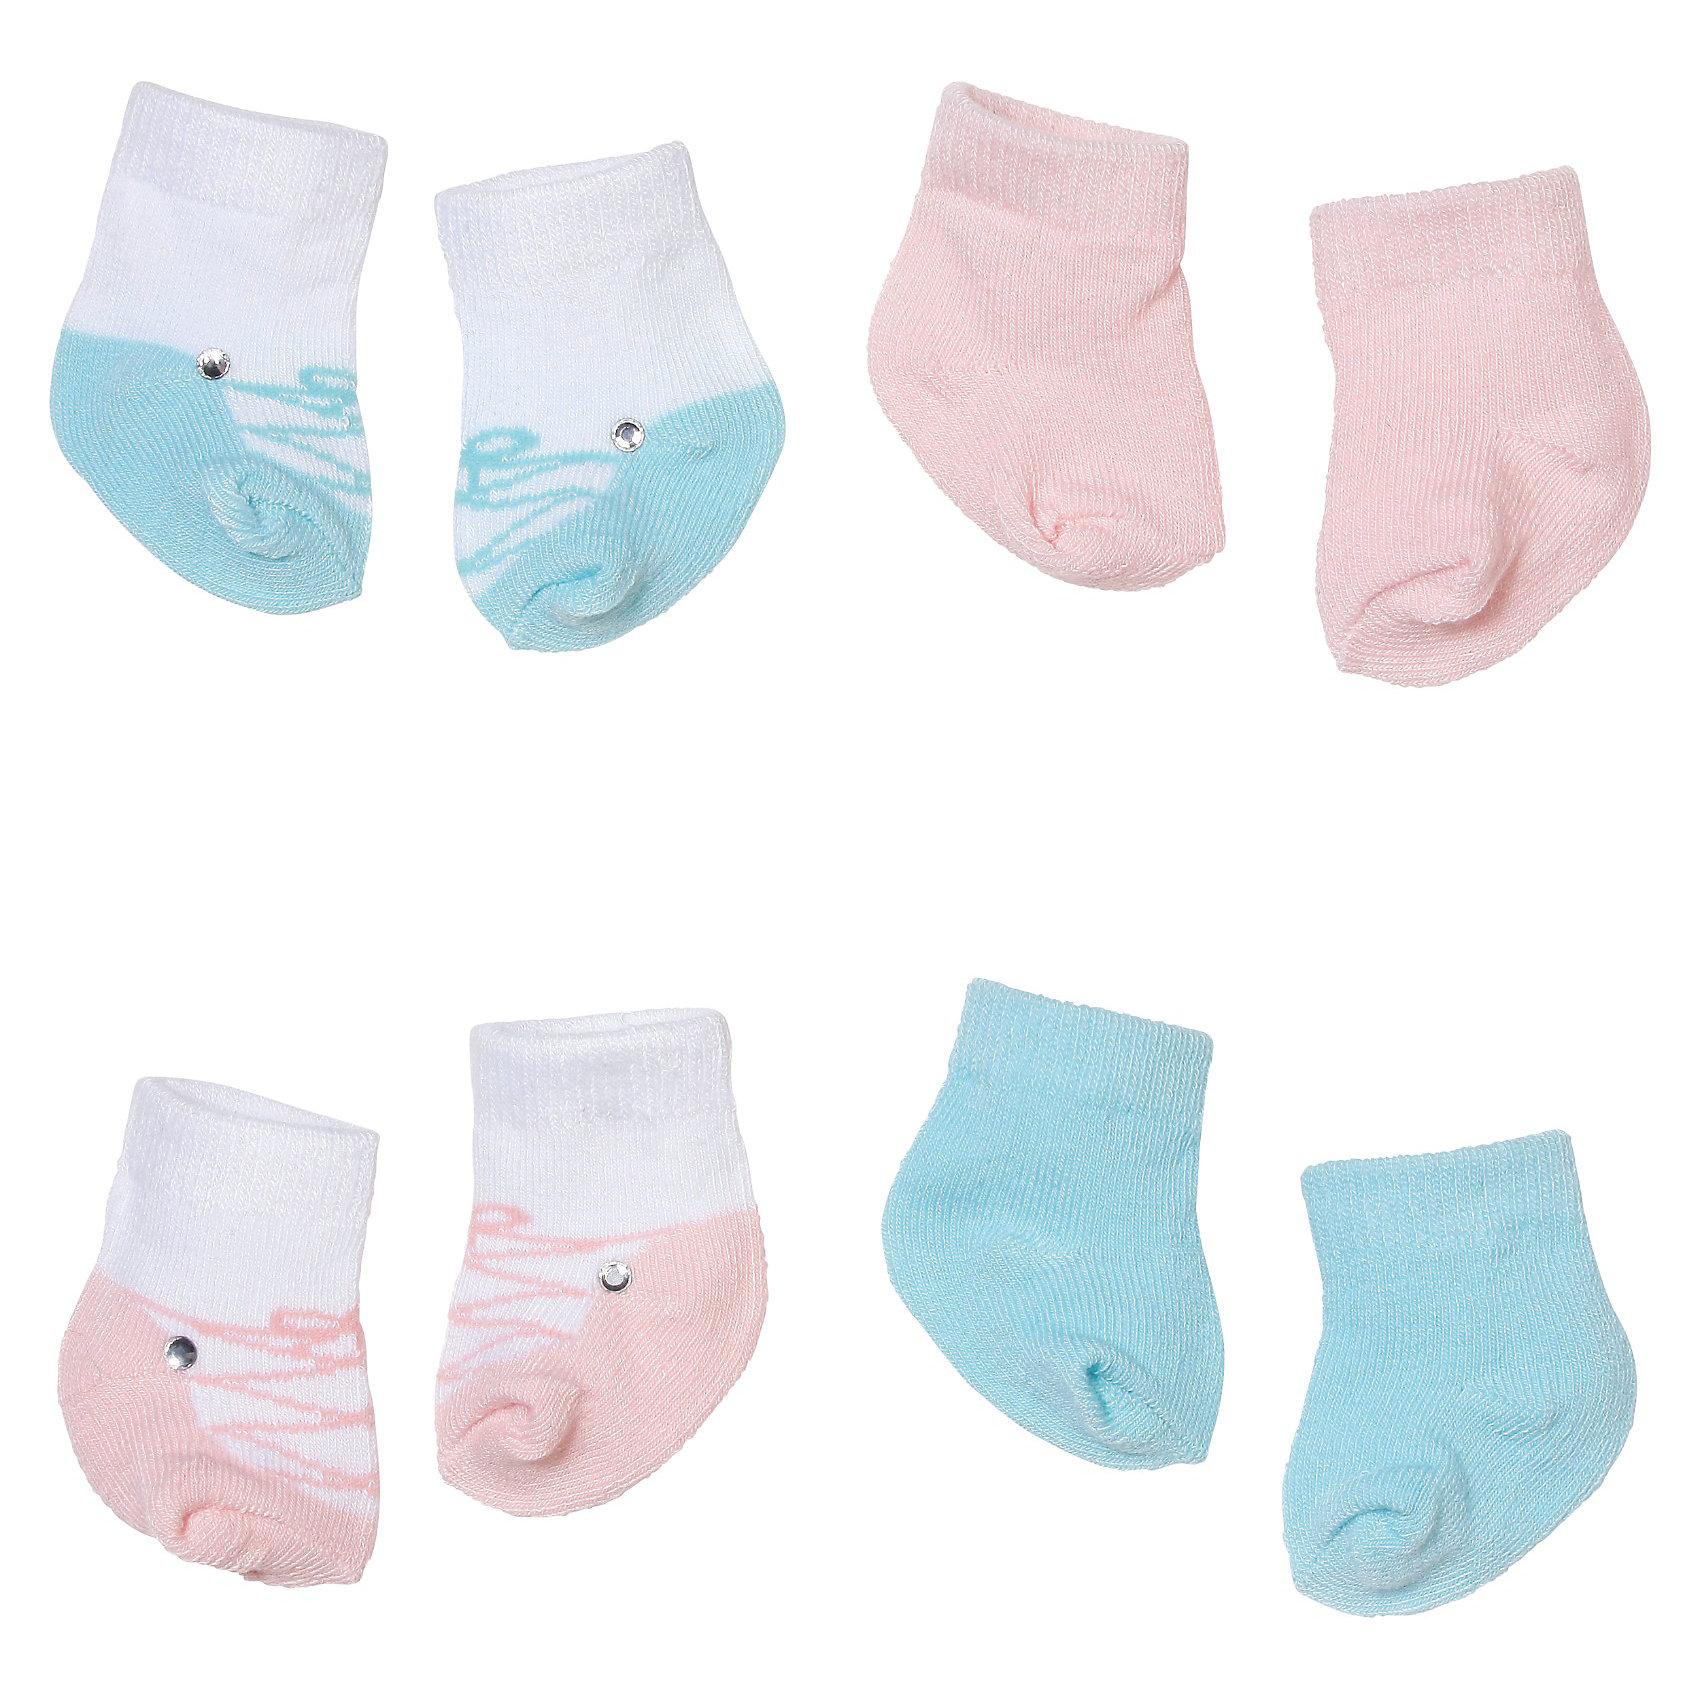 Носочки (2 пары), Baby Annabell, в ассортиментеНосочки для куклы Baby Annabell 46 см. В каждом наборе по две пары носков.<br><br>Ширина мм: 181<br>Глубина мм: 131<br>Высота мм: 16<br>Вес г: 28<br>Возраст от месяцев: 36<br>Возраст до месяцев: 60<br>Пол: Женский<br>Возраст: Детский<br>SKU: 3151243